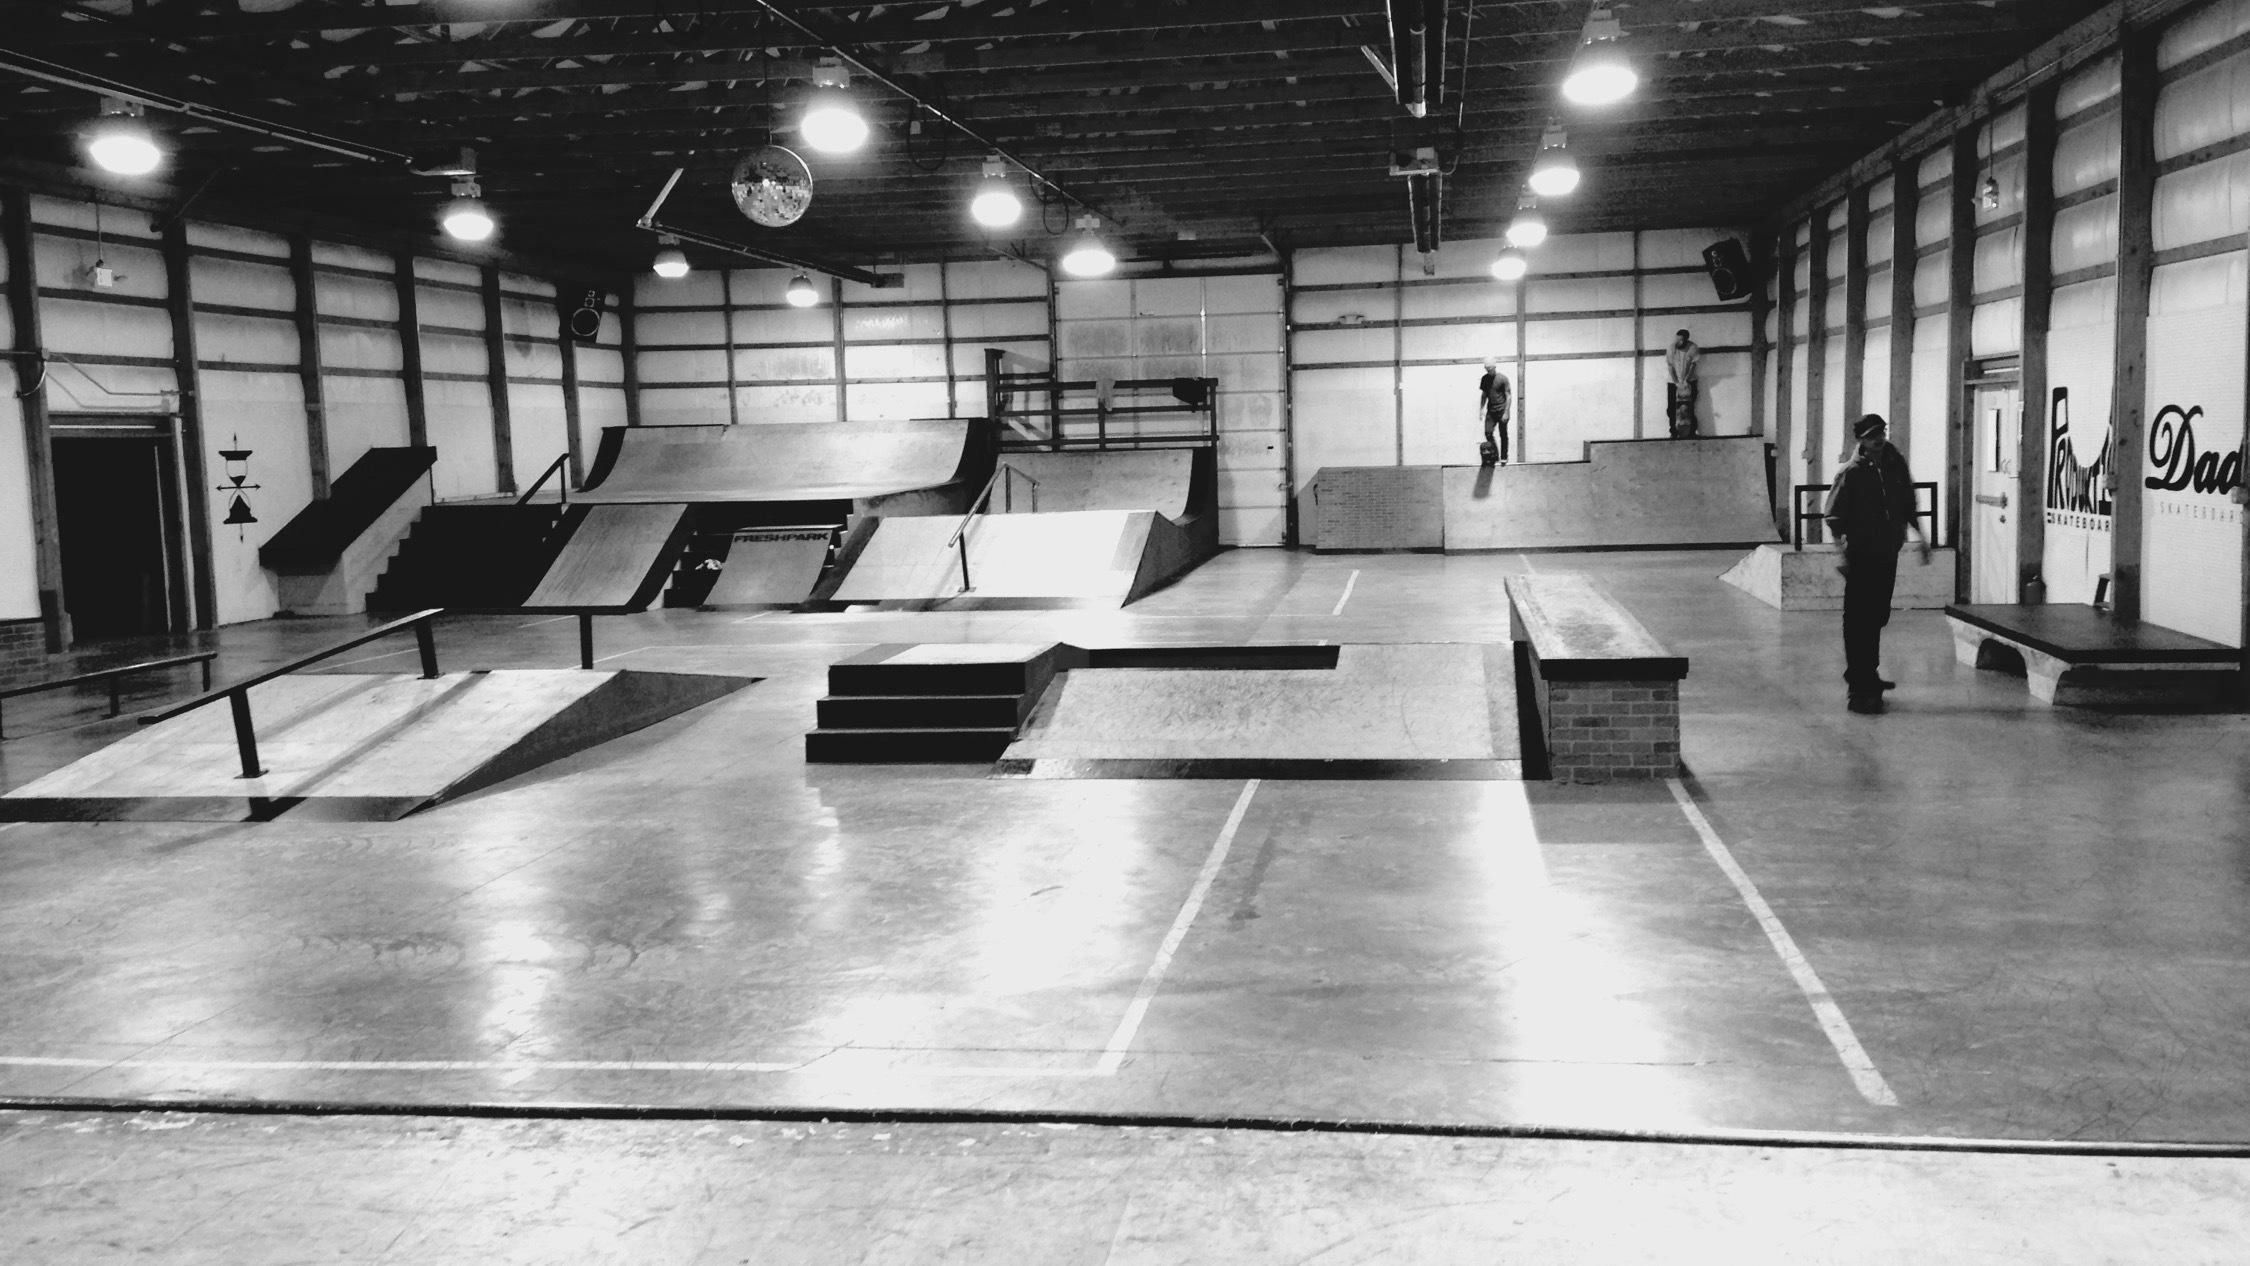 People doing tricks at Skatepark